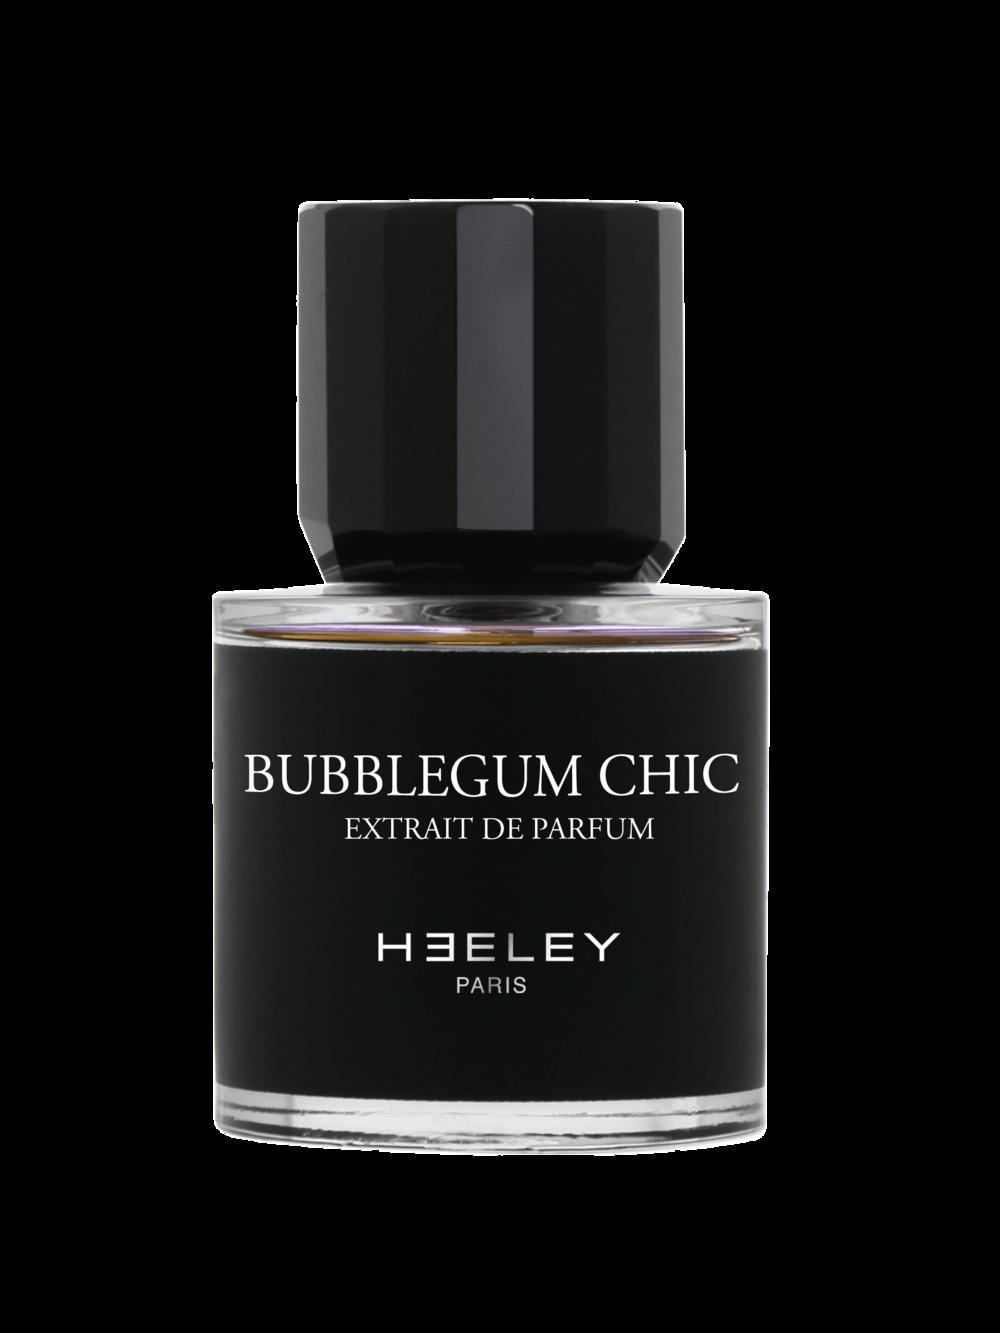 Heeley-Extrait-50ml-Bubblegum-Chic-1800x2400px (1).png